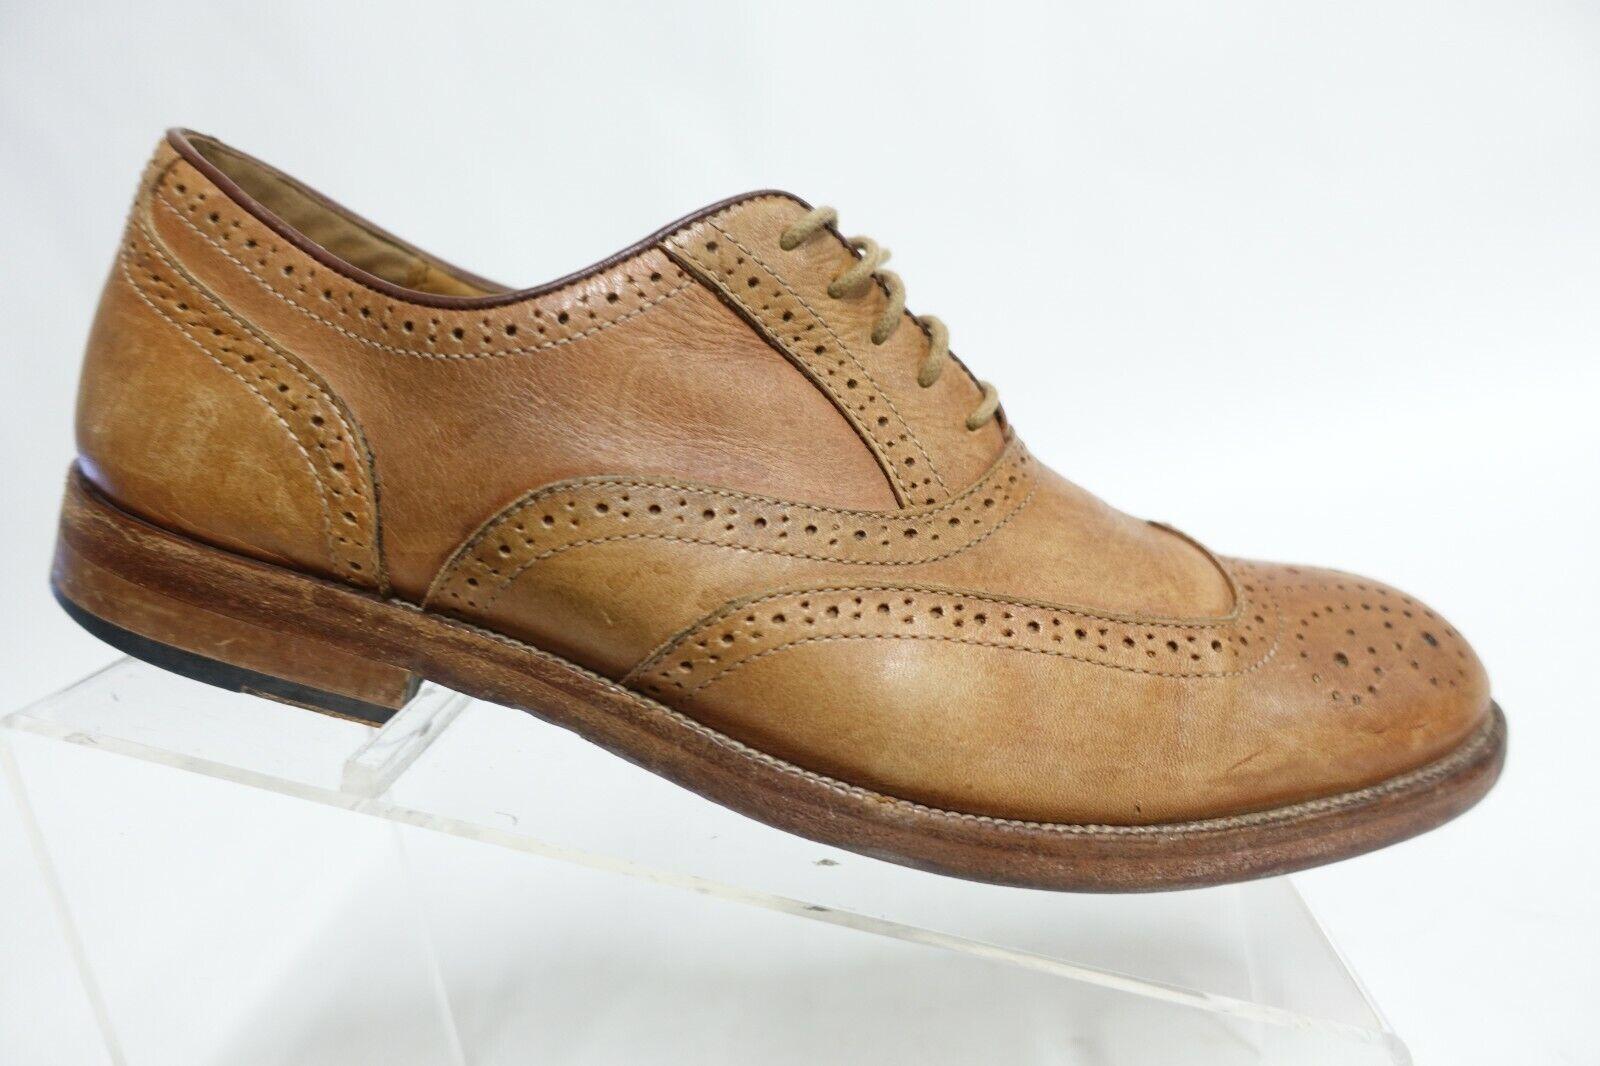 JOHNSTON & MURPHY Brown Sz 9.5 M Men Leather Wingtip Oxfords